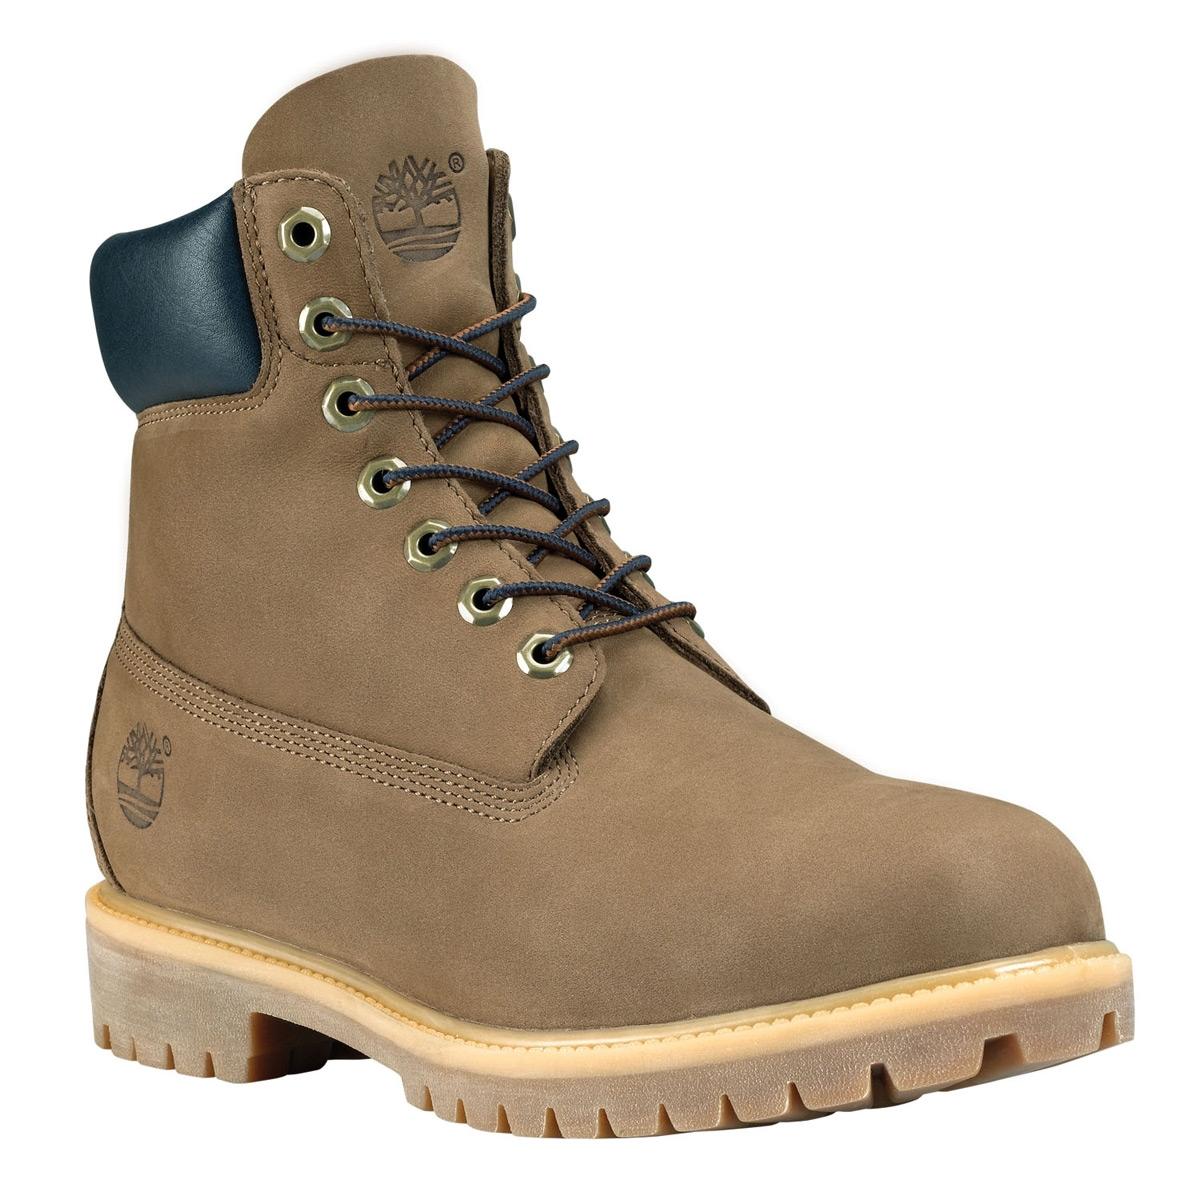 Image of Timberland Icon Classic 6 Inch Premium Original Boot (Men's) Otter Waterbuck